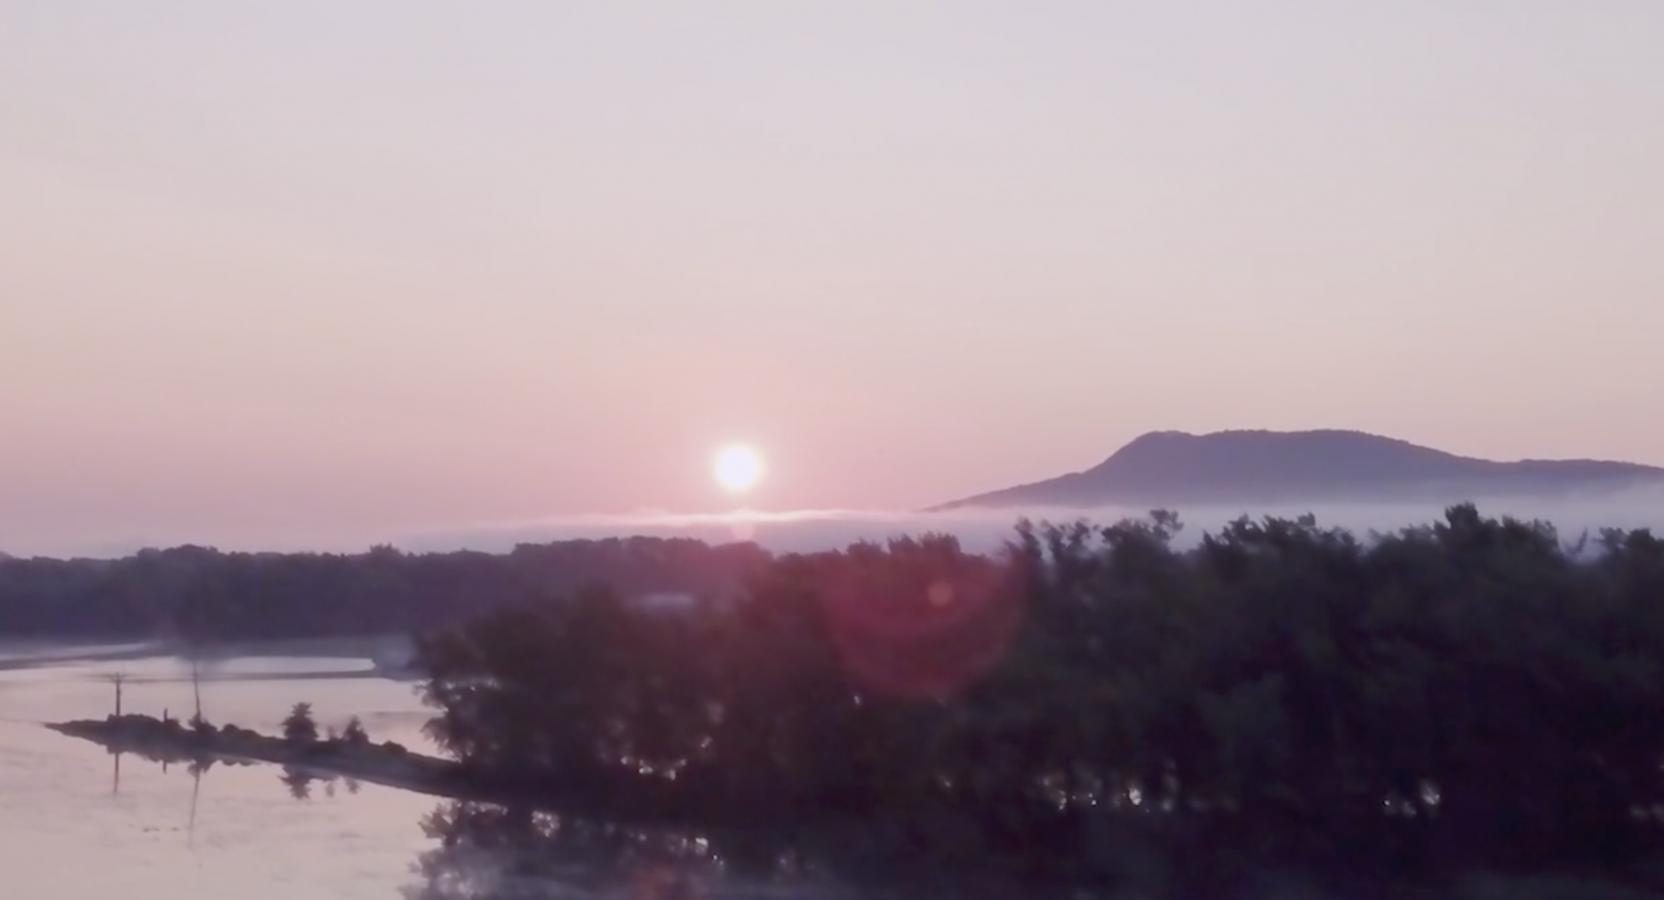 Sunrise in the Pioneer Valley